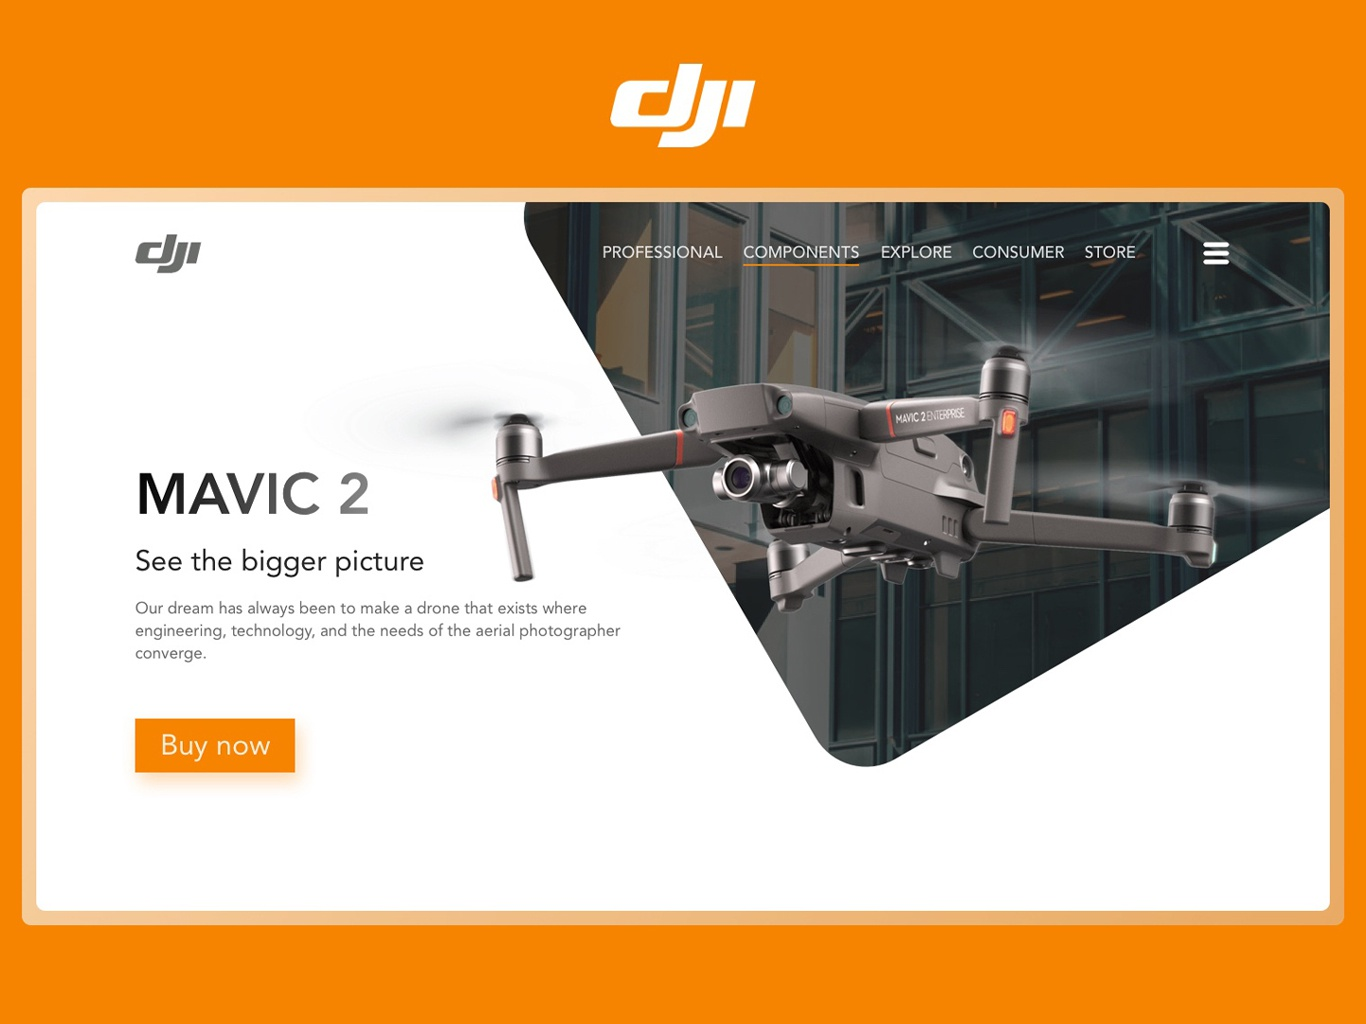 Dji Concept Store Page landingpage landing quadcopter drone dji concept ui ux